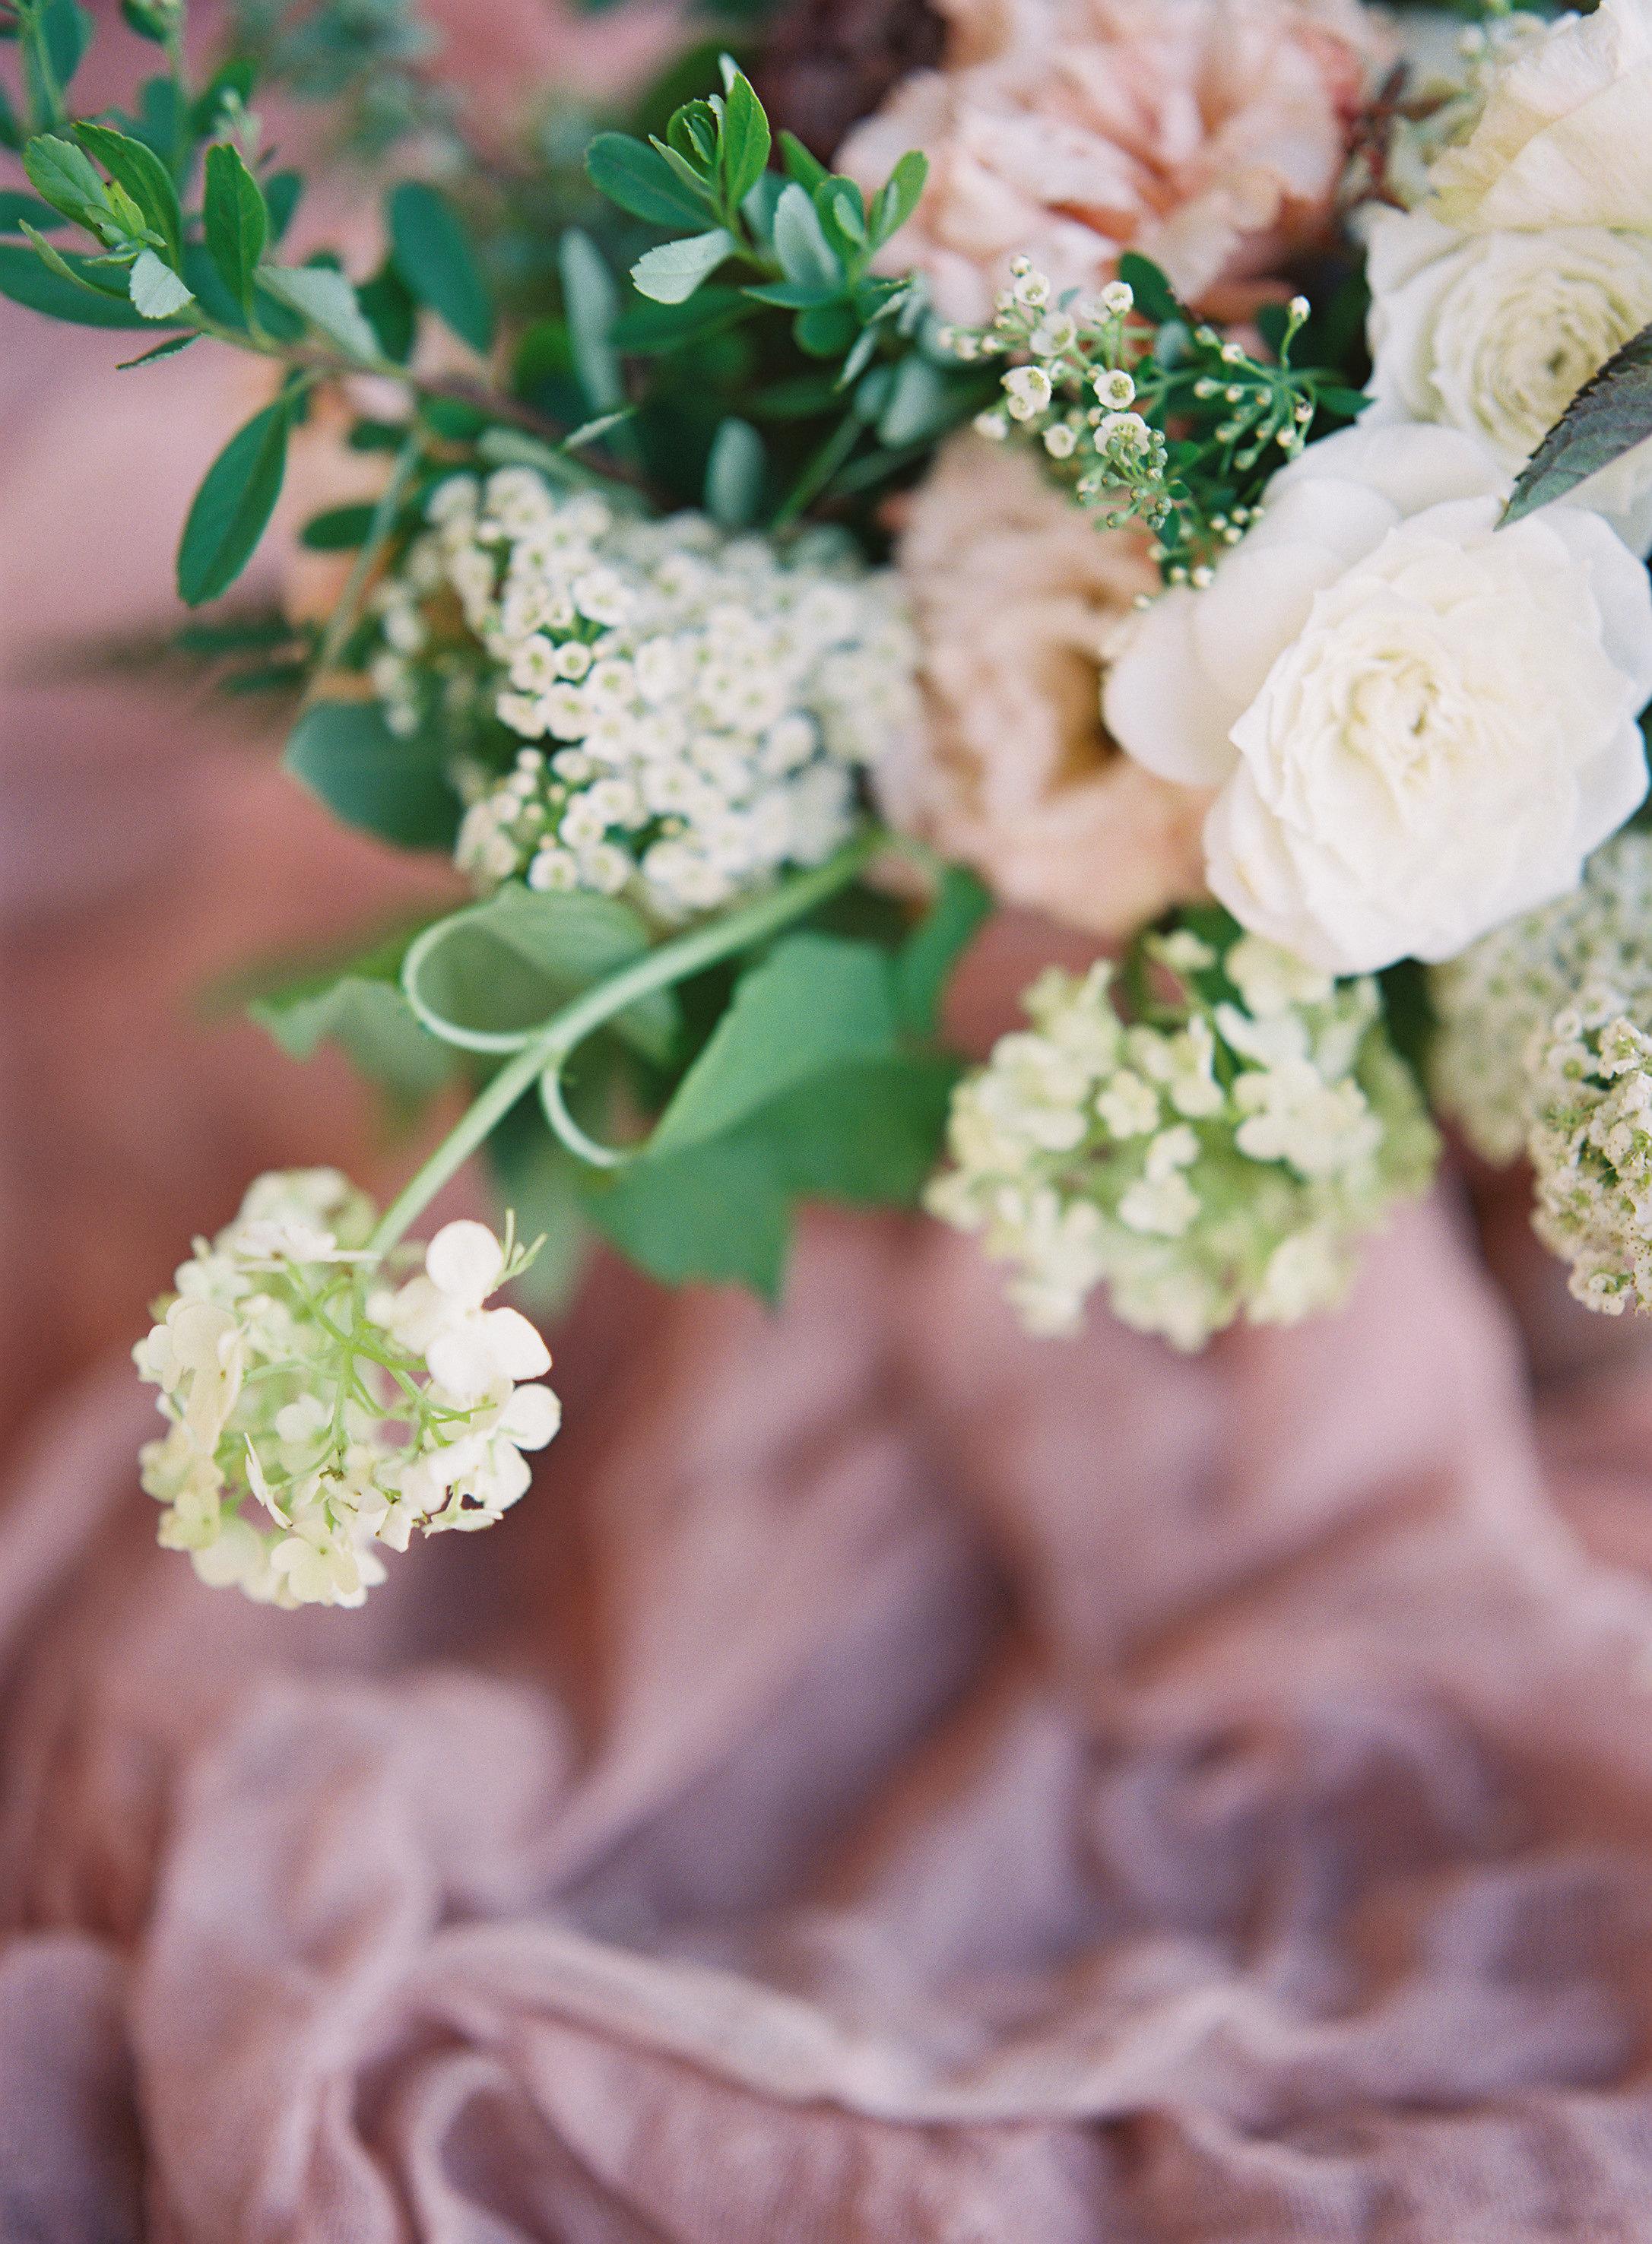 jessica-zimmerman-events-arkansas-mountain-wedding-floral-arrangment-mauve.jpg